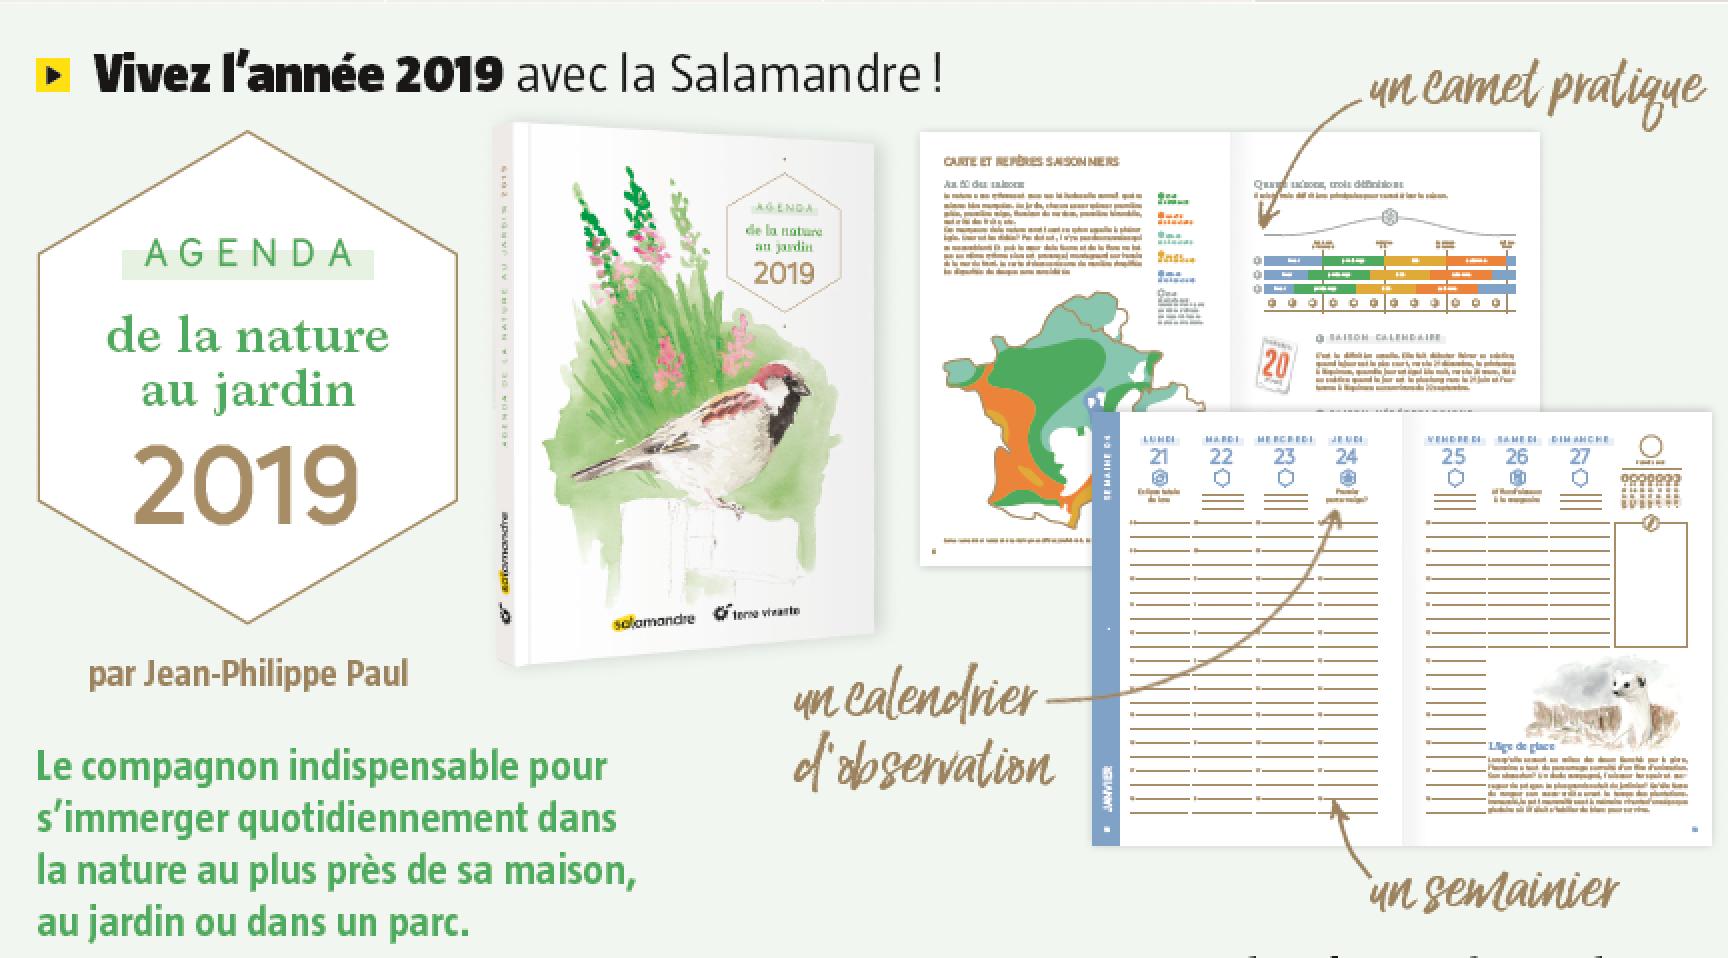 Agenda nature jardin 2019 La Salamandre Terre Vivante